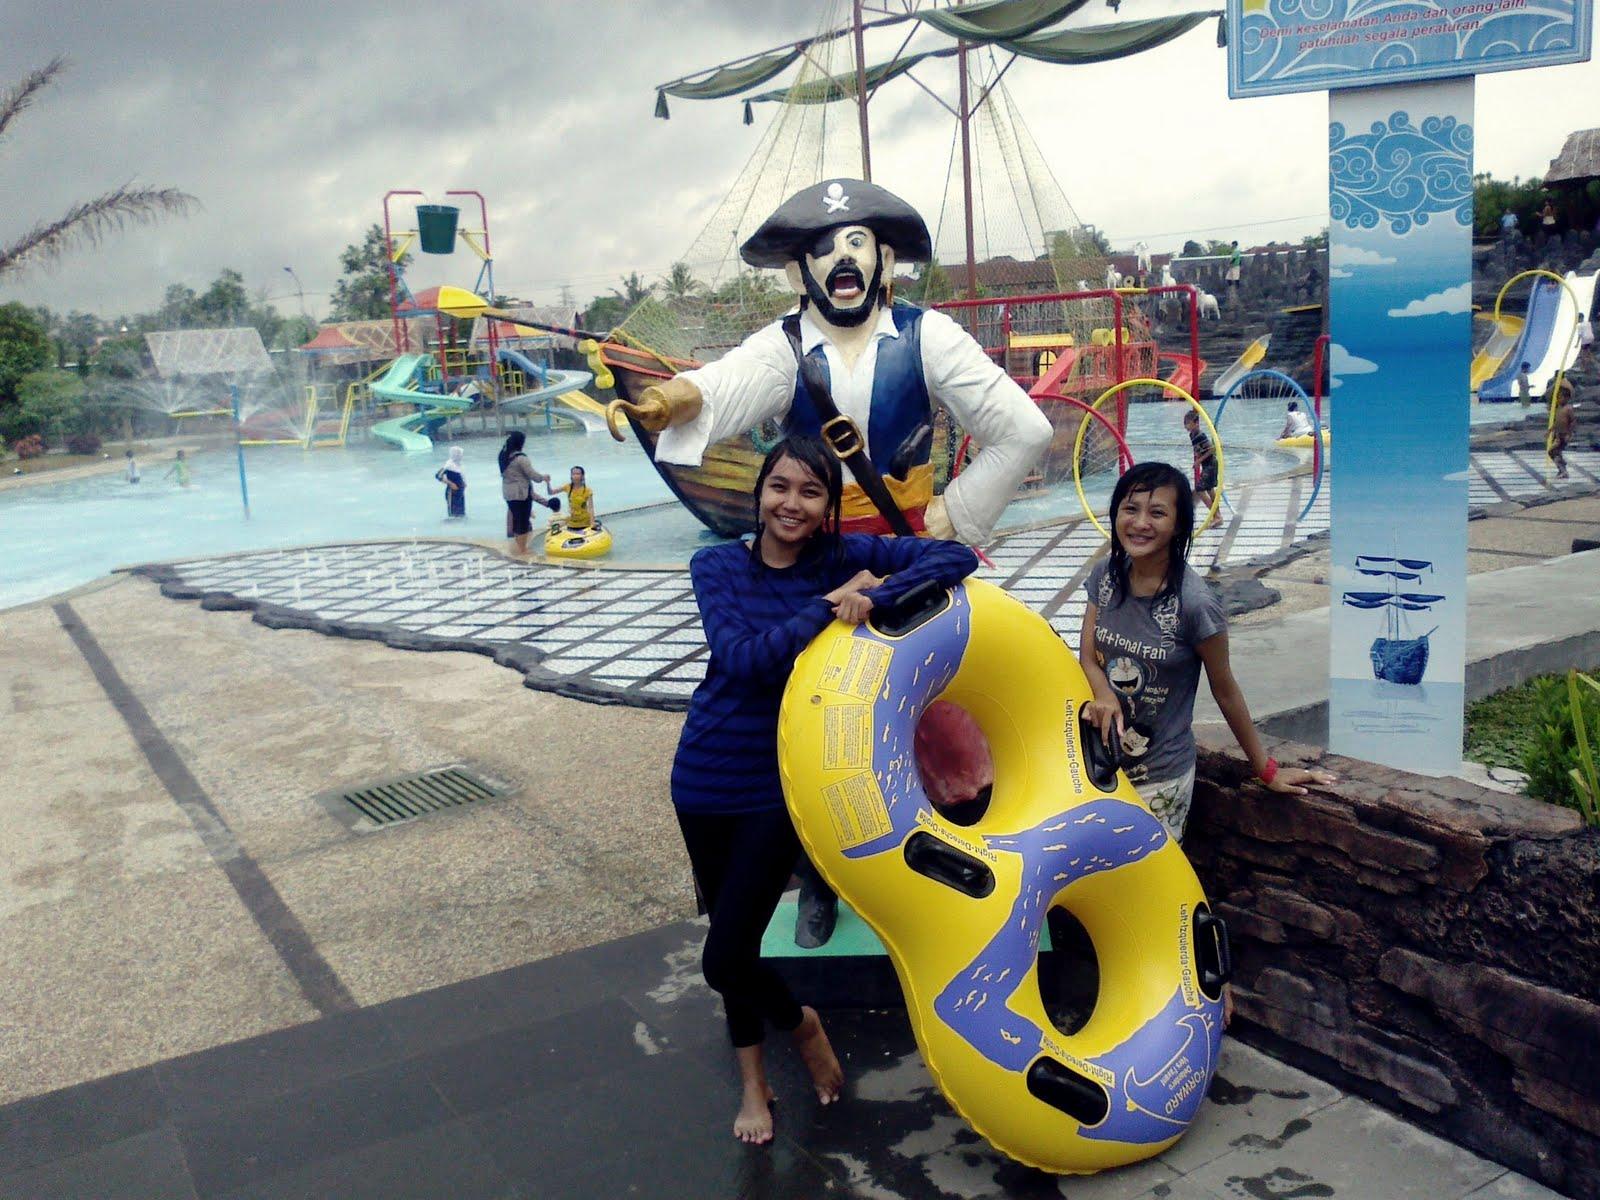 Foto-foto Tee Jay Waterpark Tasikmalaya